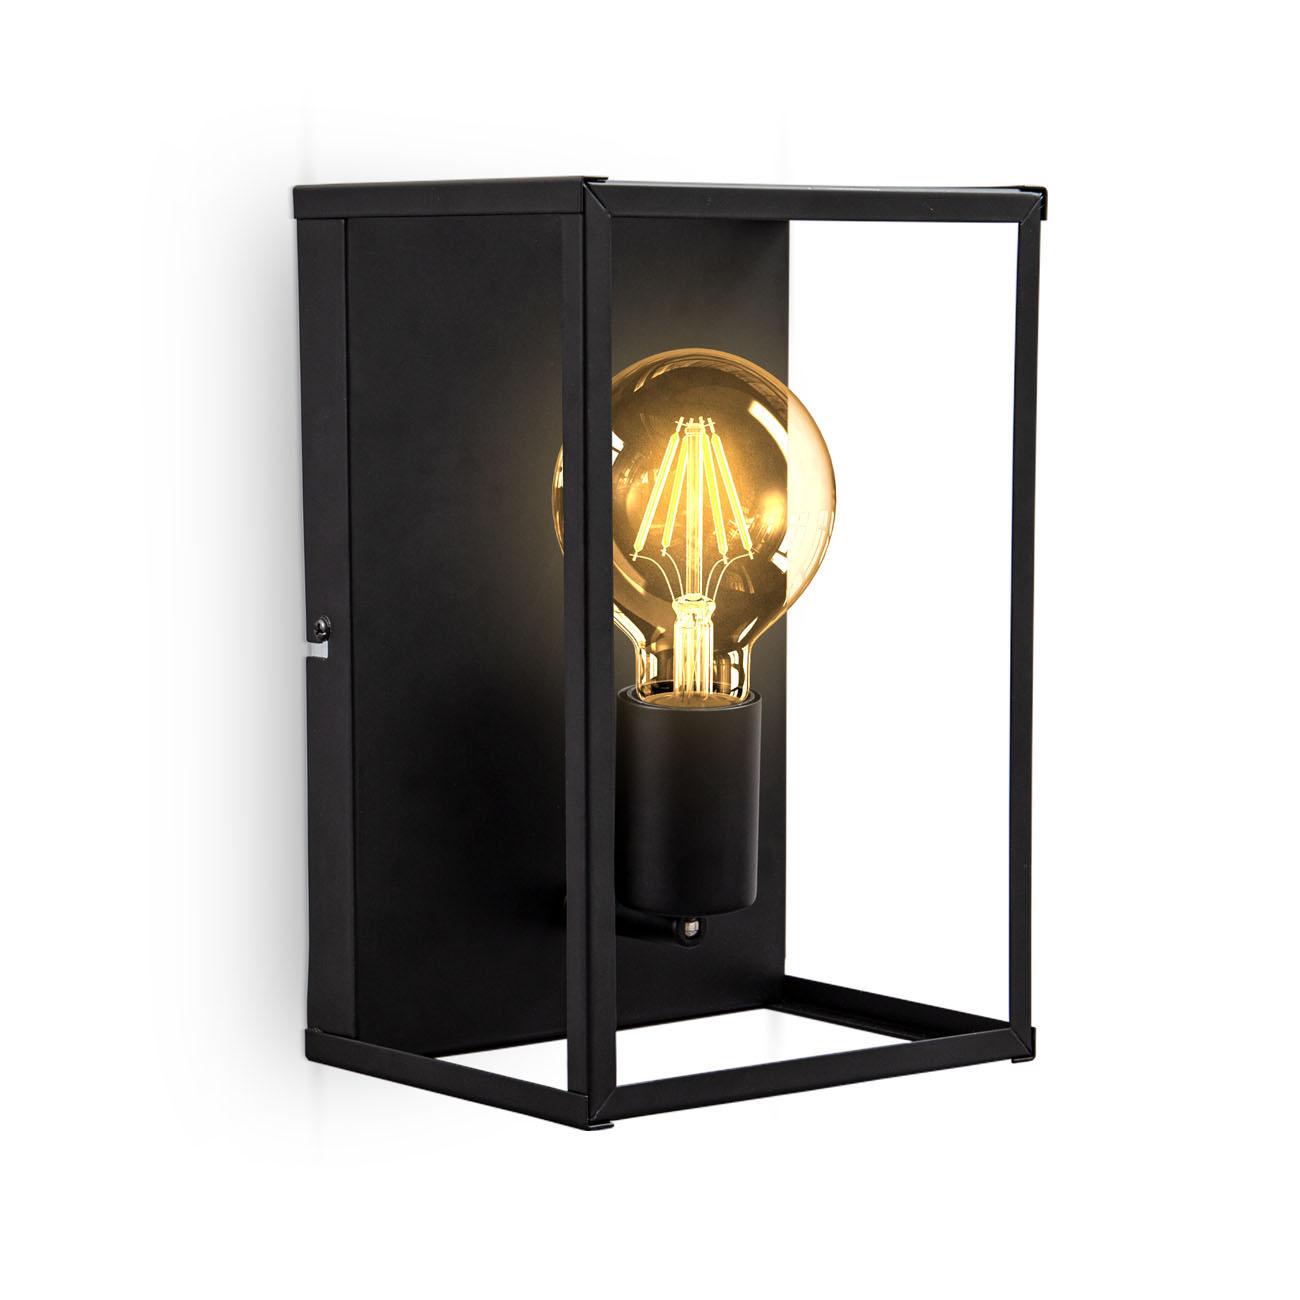 Vintage Käfig-Wandlampe Metall schwarz E27